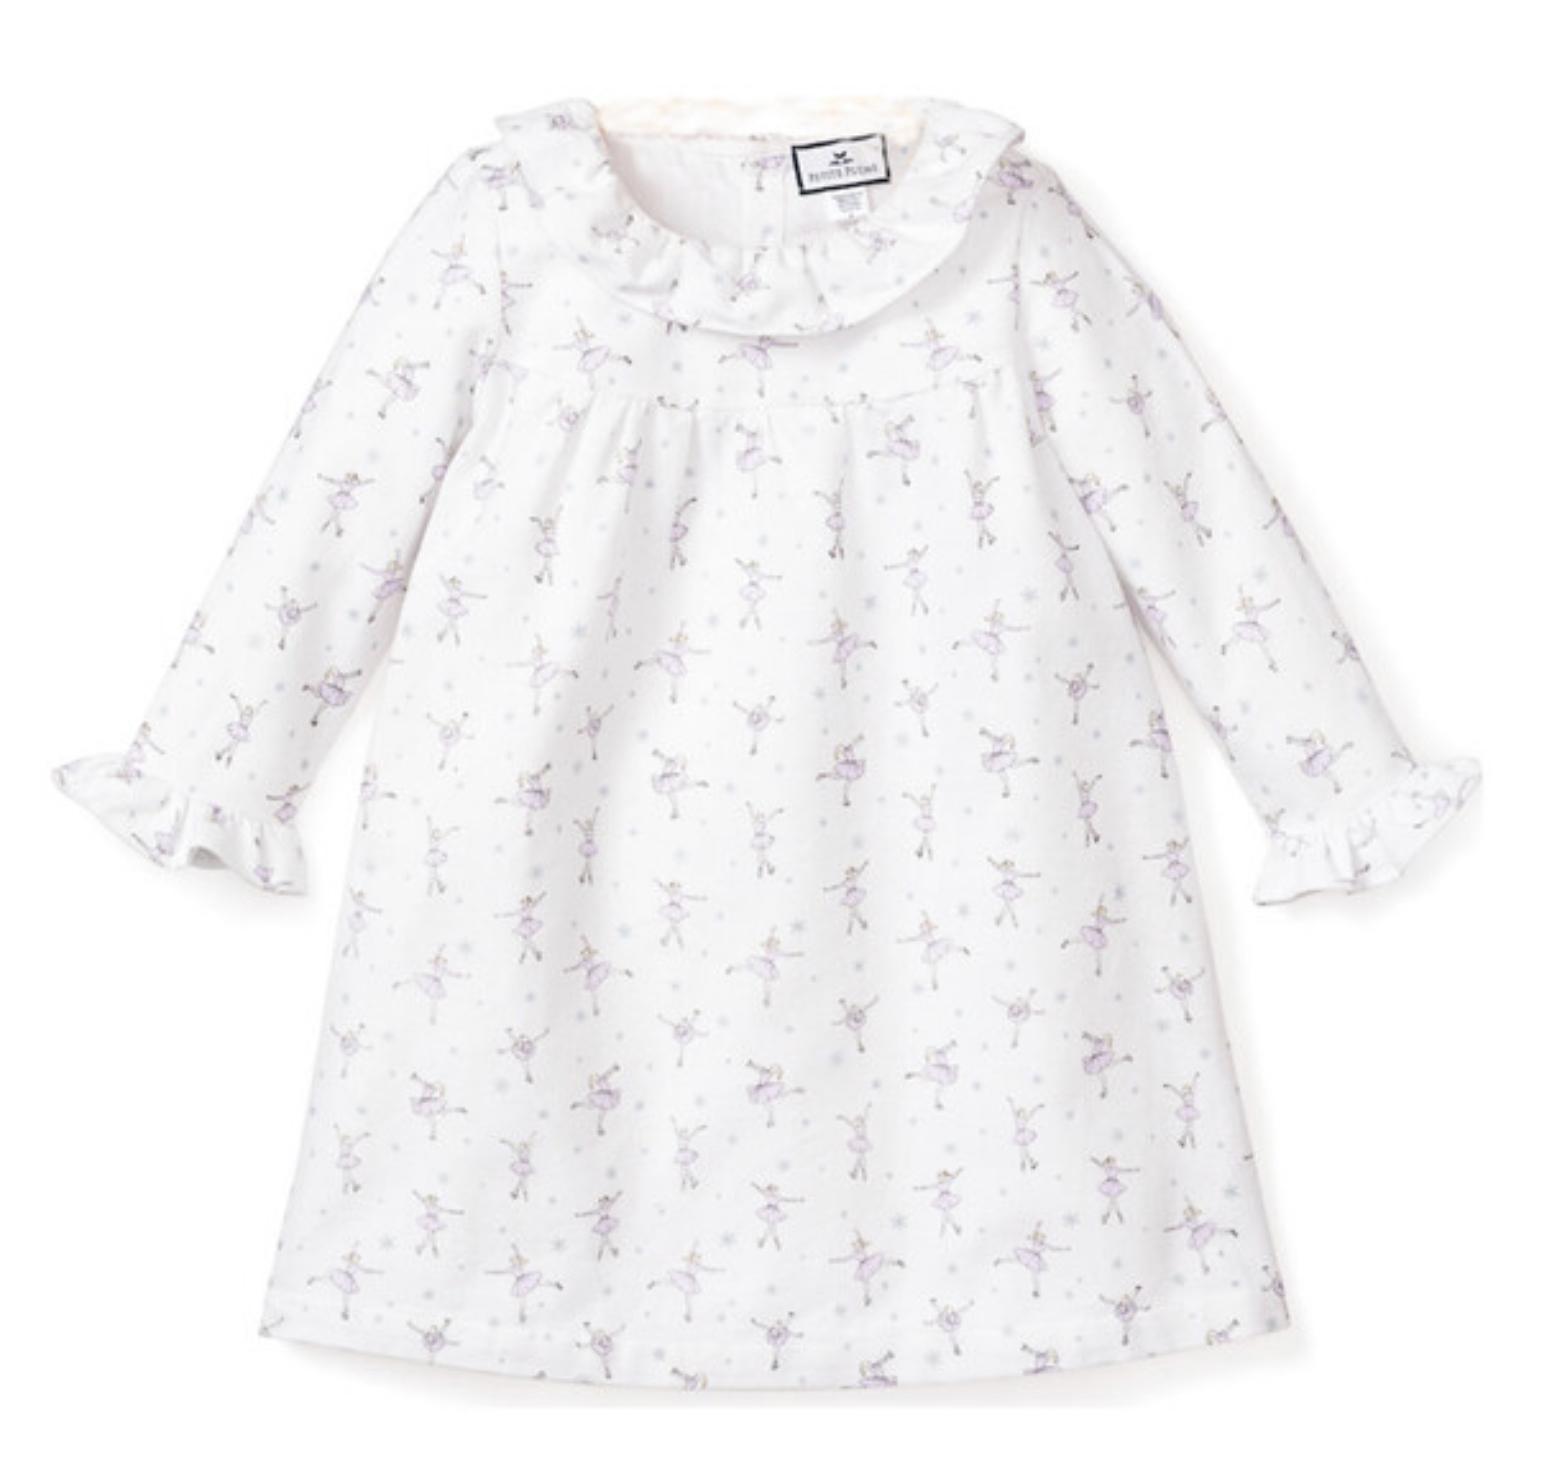 Petite Plume Scarlett Nightgown, Ice Dancer